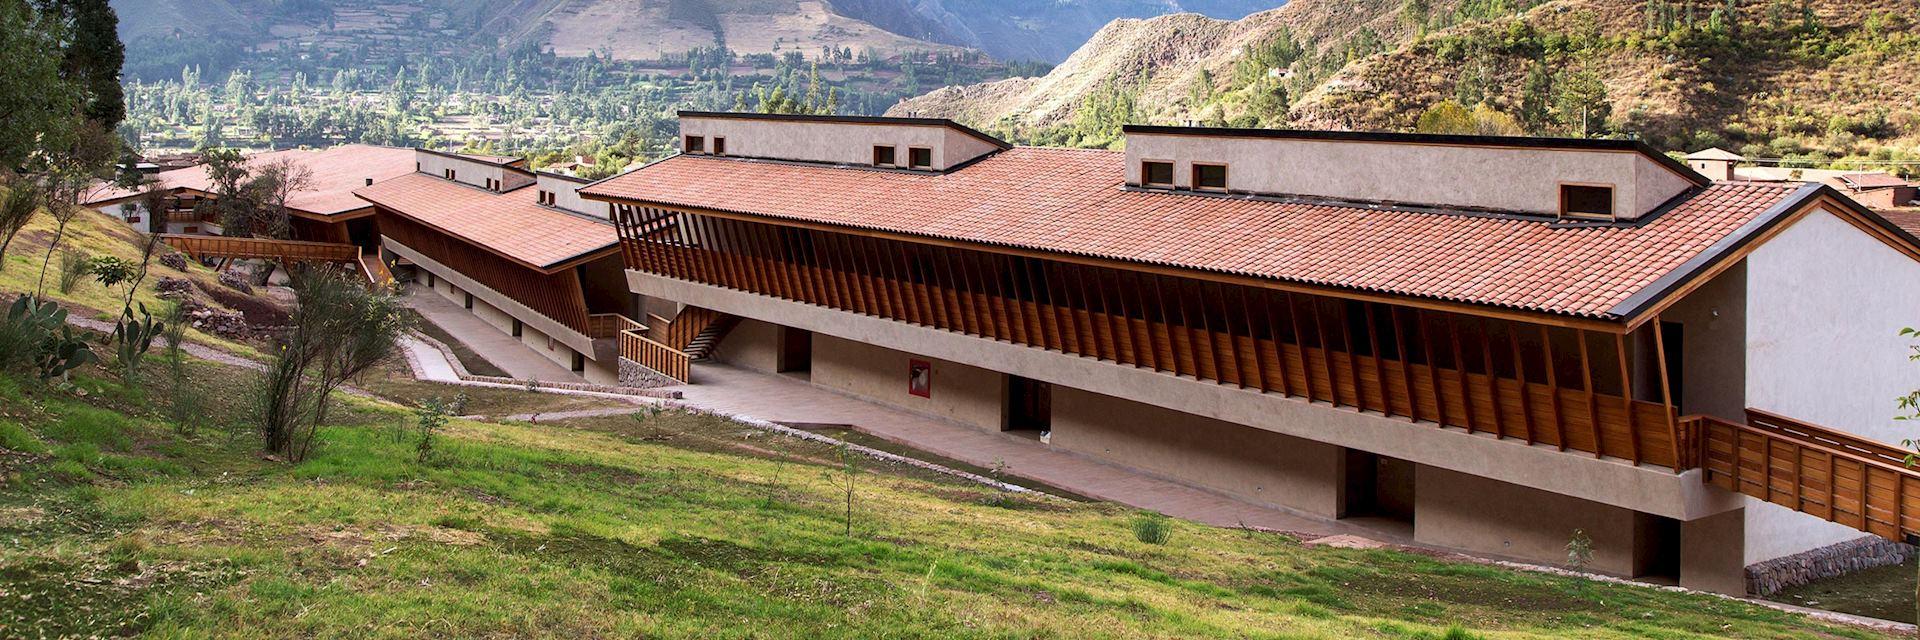 Explora Valle Sagrado, Sacred Valley